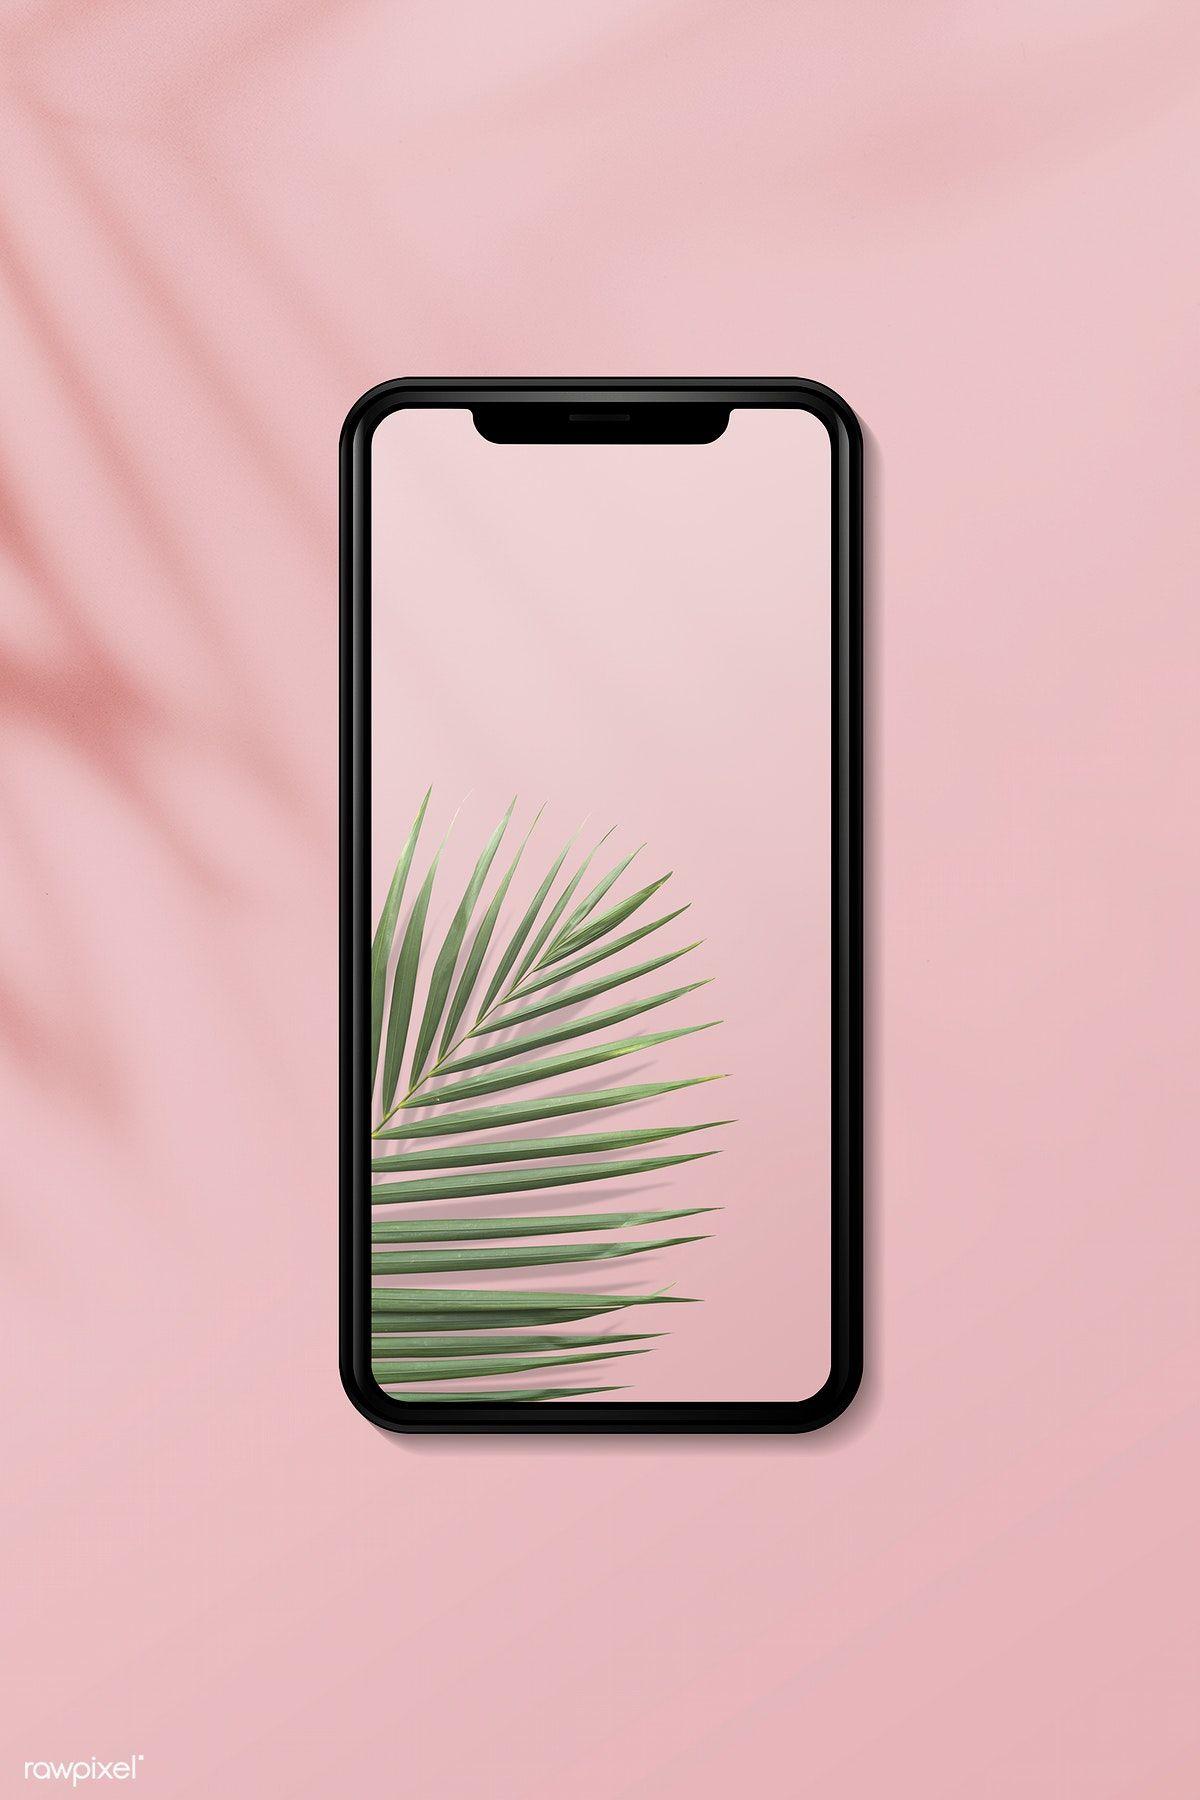 Download Premium Psd Of Blank Smartphone Screen Mockup Design 935114 Mockup Design Instagram Frame Phone Mockup